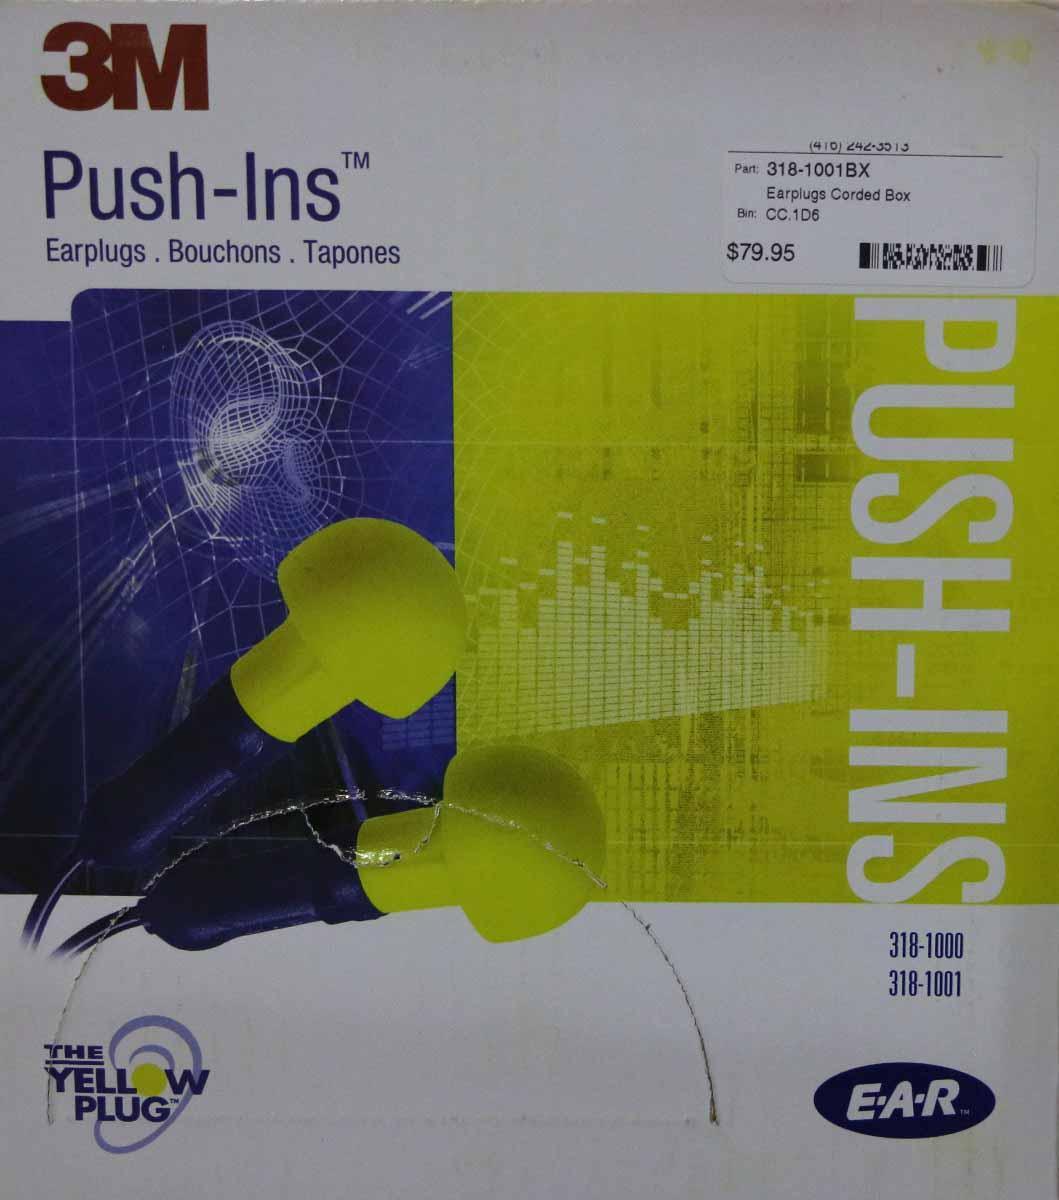 3M Push-In EAR plugs